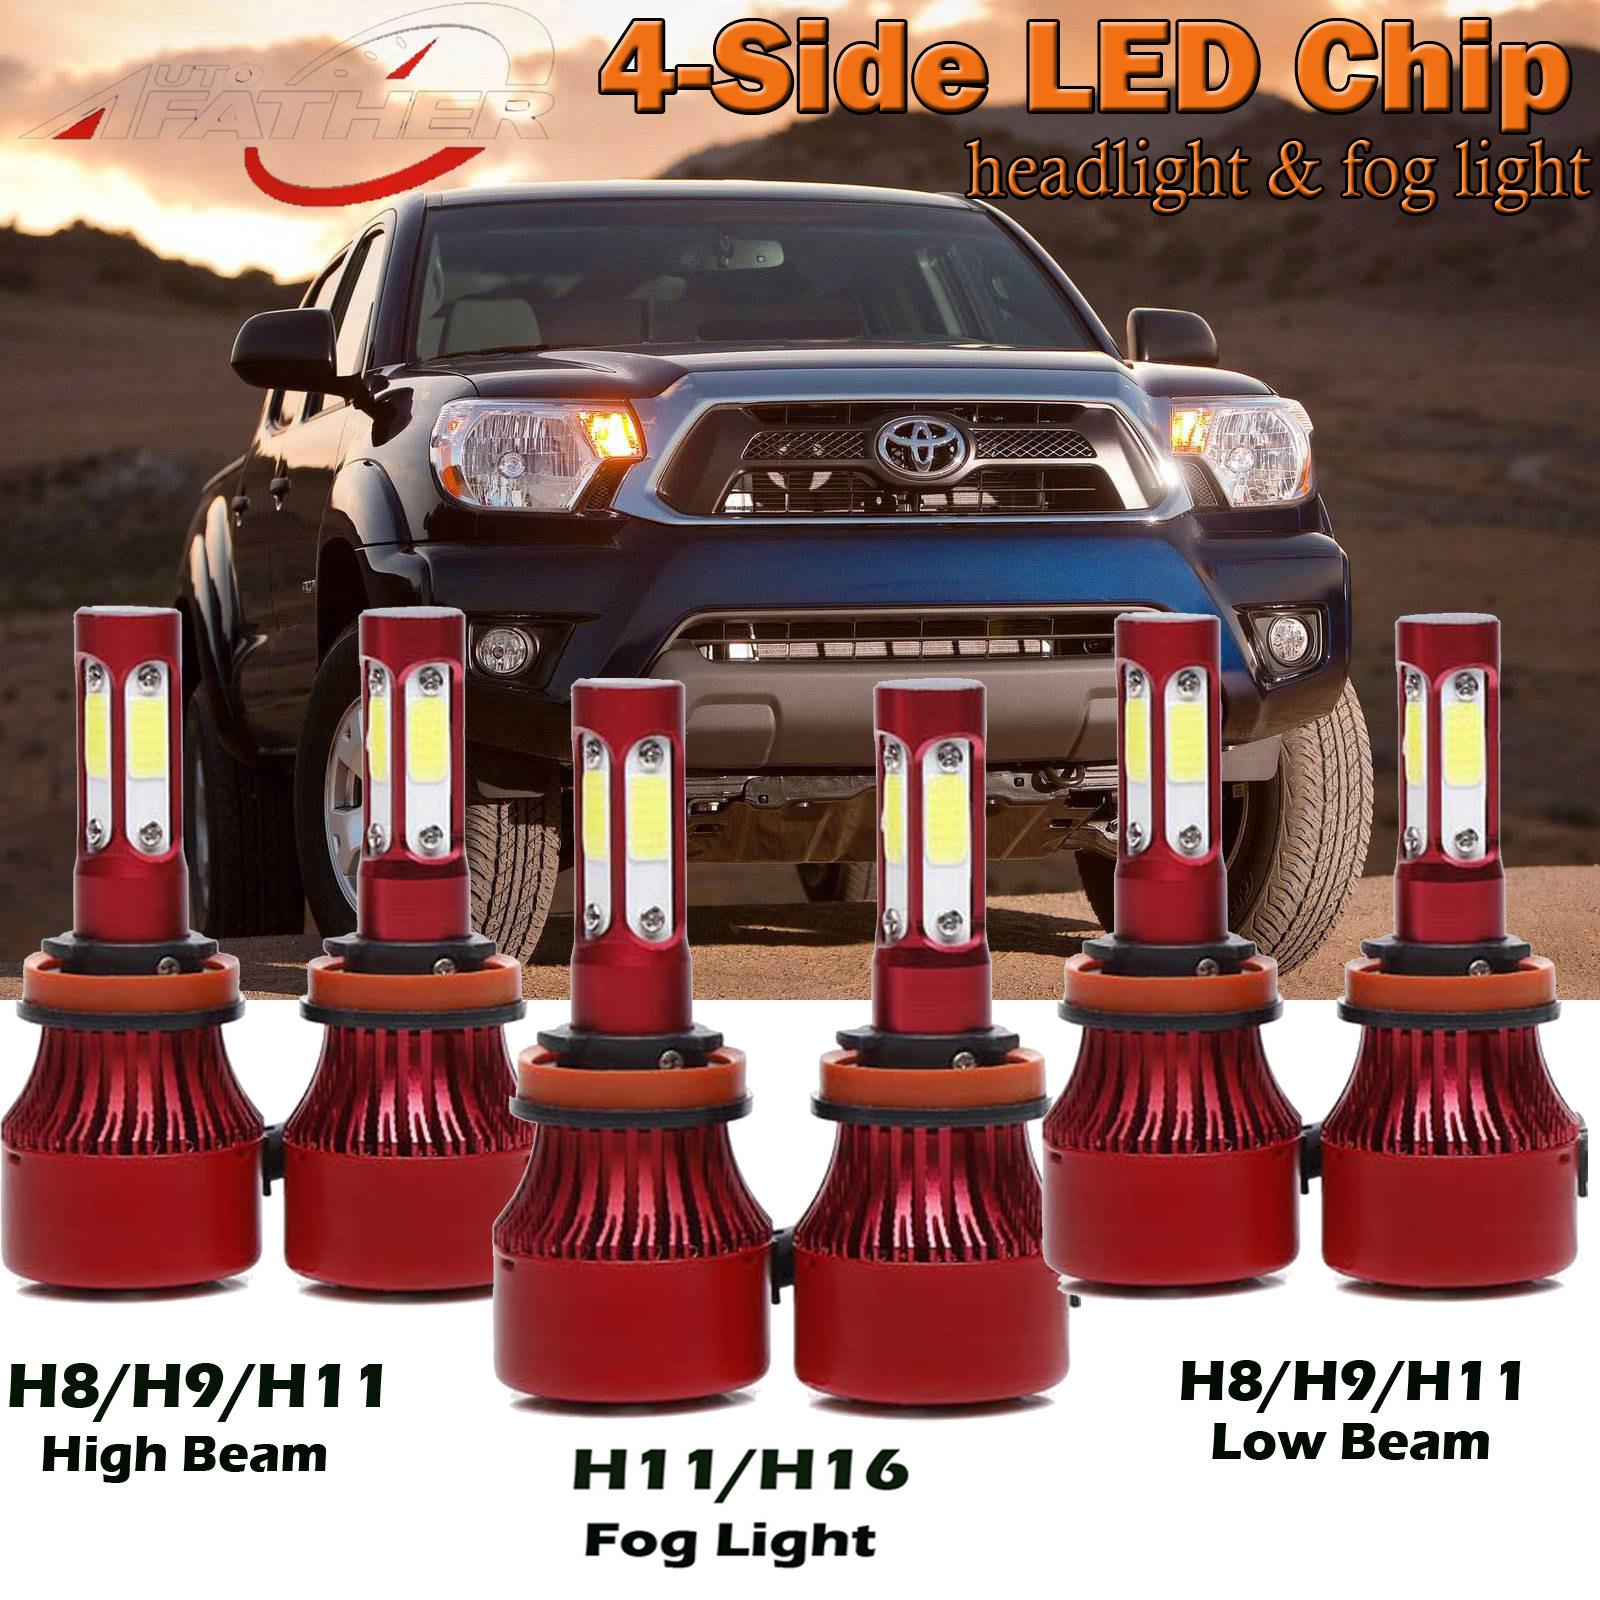 6x H11 H8 H9 LED Headlight High Low Fog Bulbs Kit for Toyota Tacoma 2016-2018